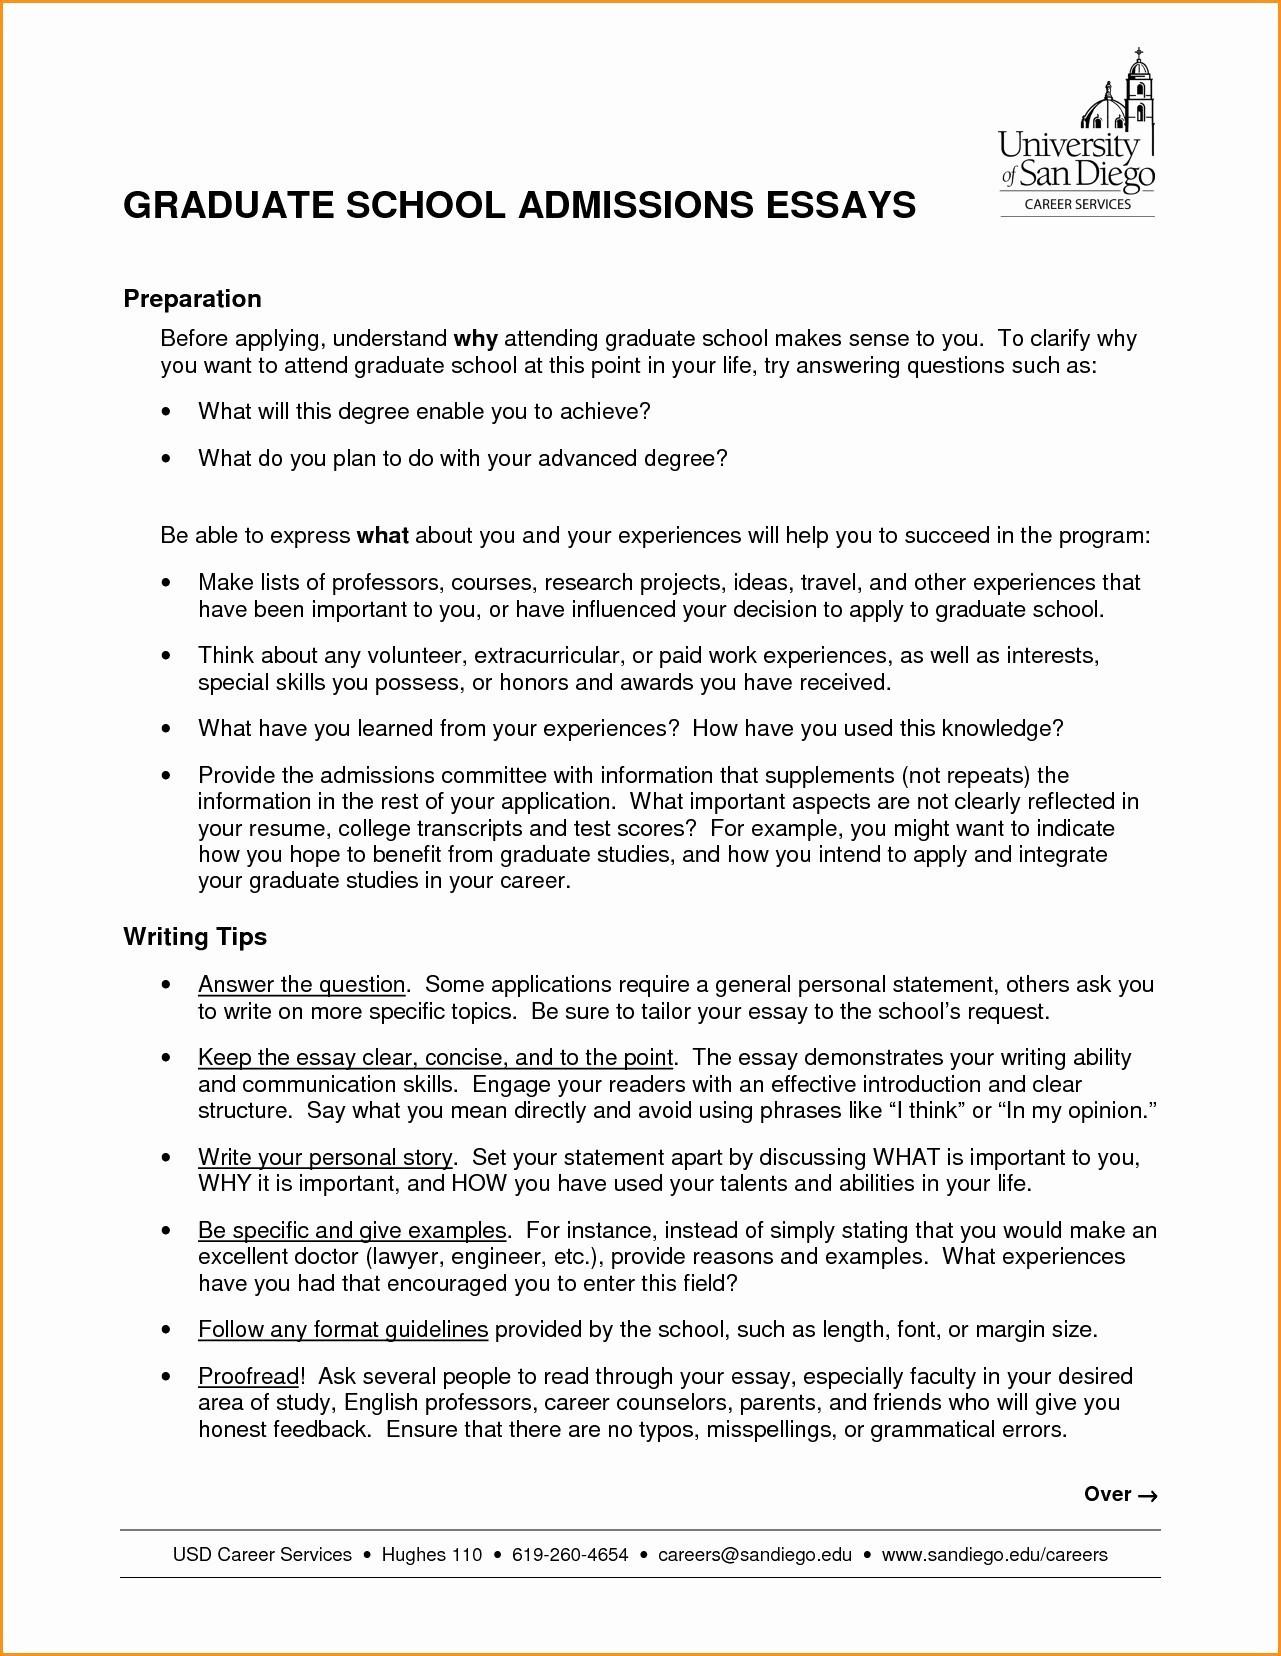 Sample Letter Of Recommendation Template Free - Literarywondrous Grad School Re Mendation Letter Sample